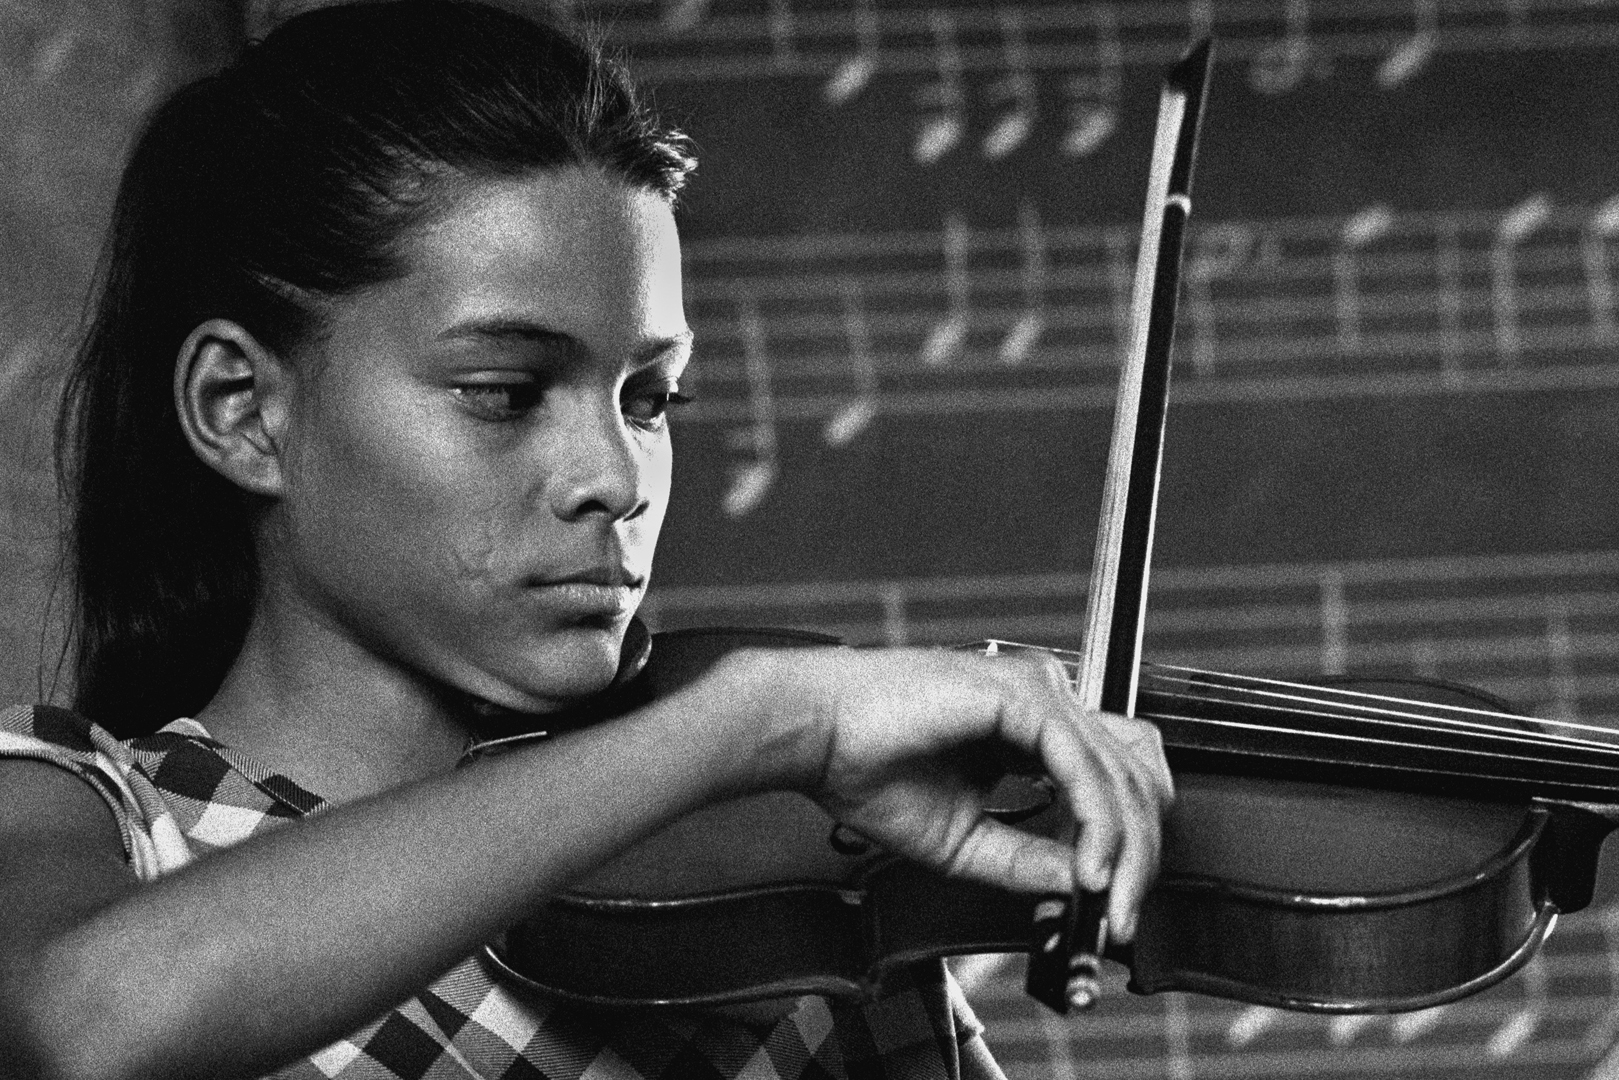 12-violinist 72.jpg